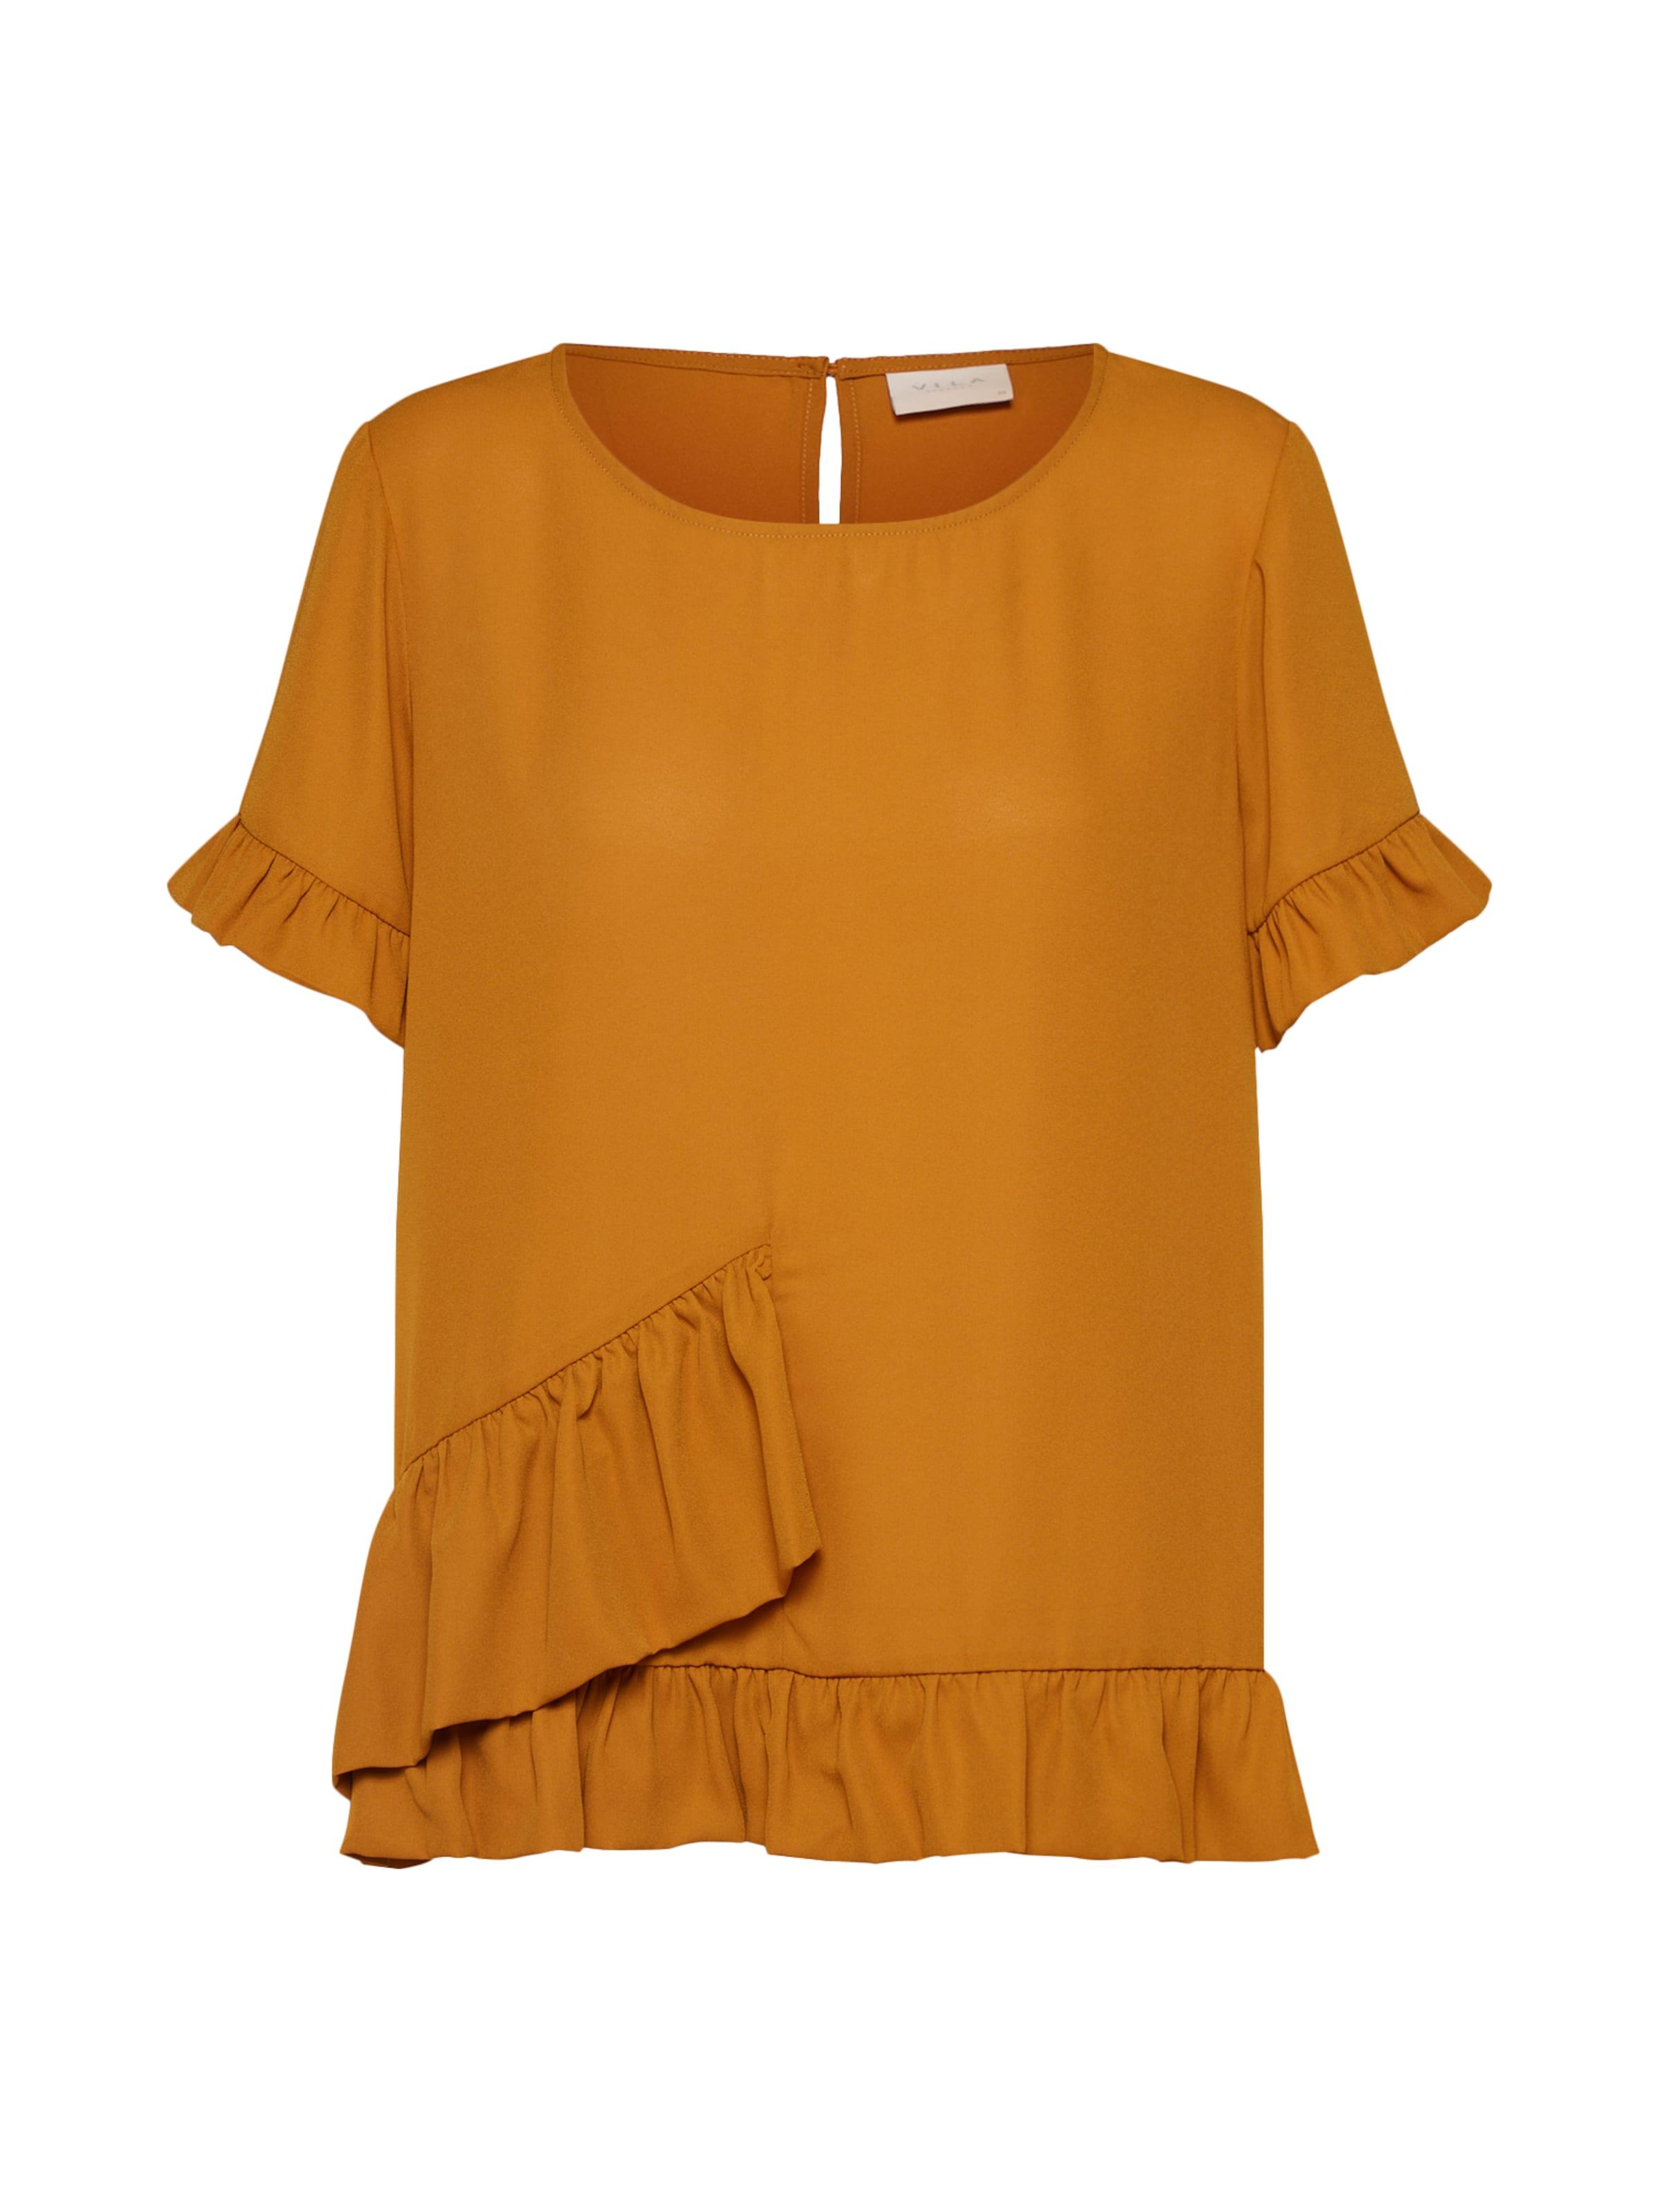 Vila T Foncé Orange shirt En l35uKJcF1T